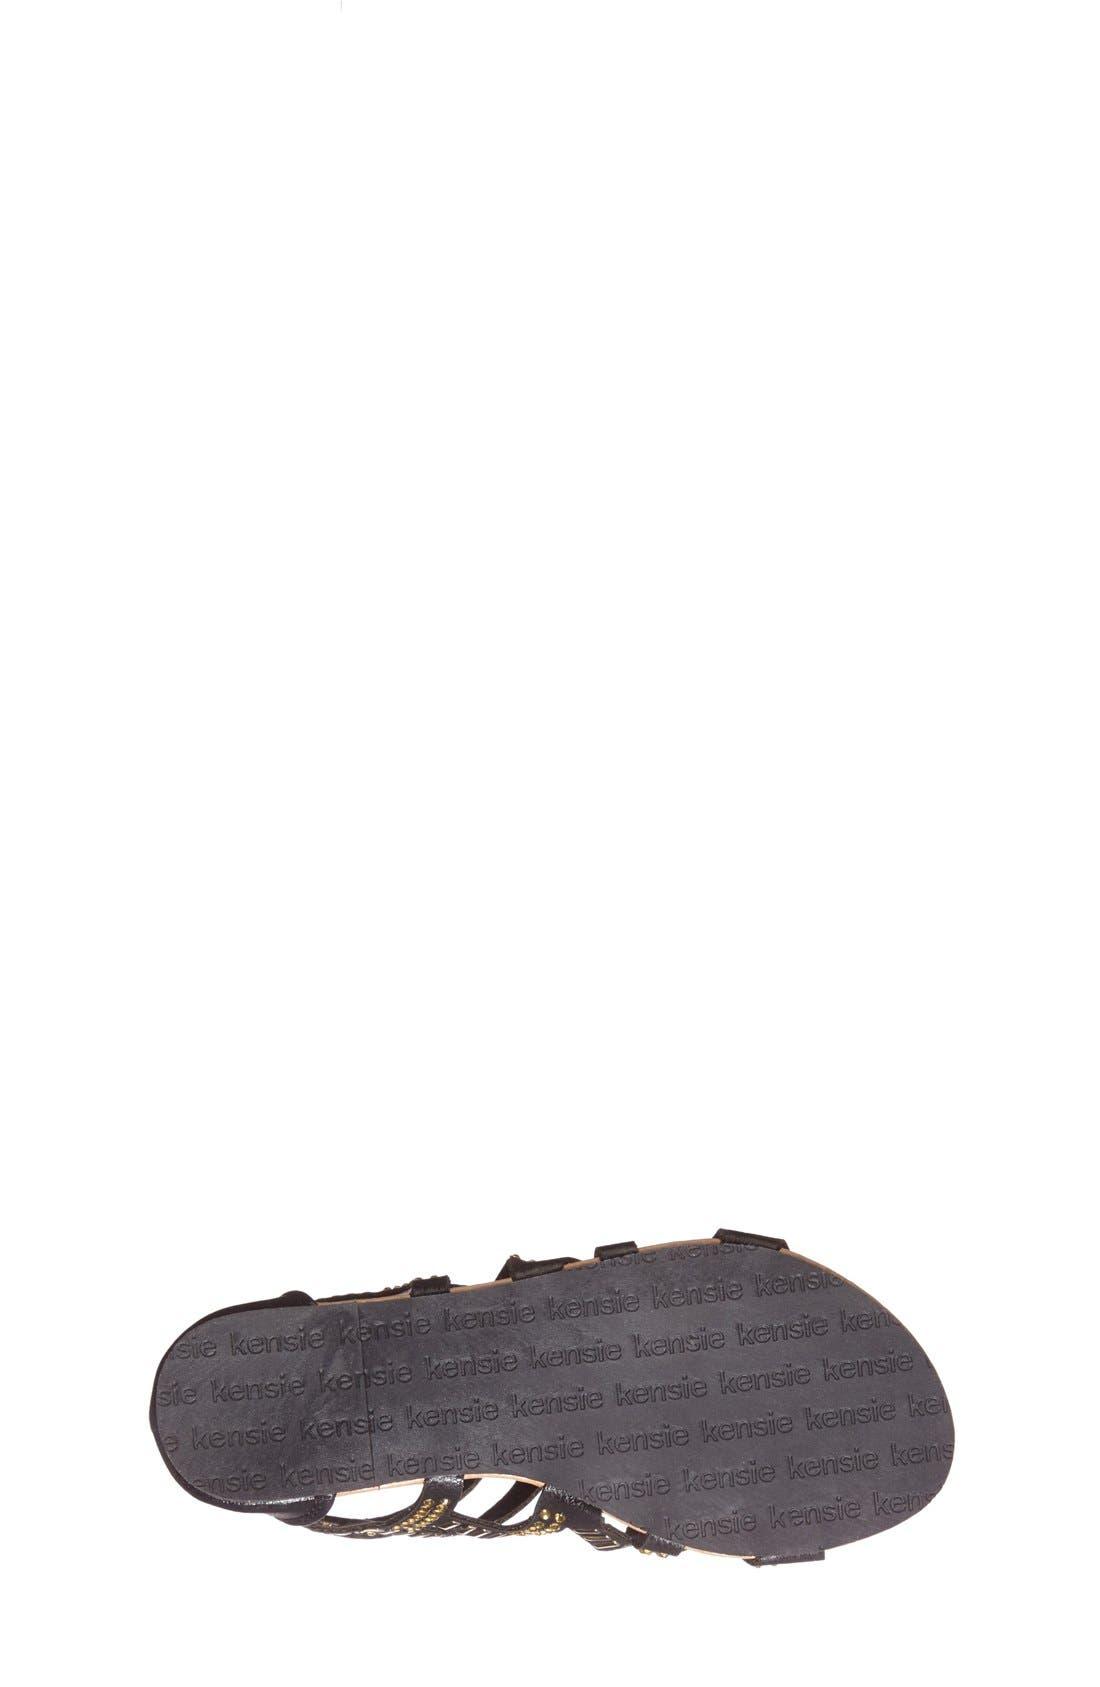 Alternate Image 4  - kensie girl Studded Strap Sandal (Toddler, Little Kid & Big Kid)